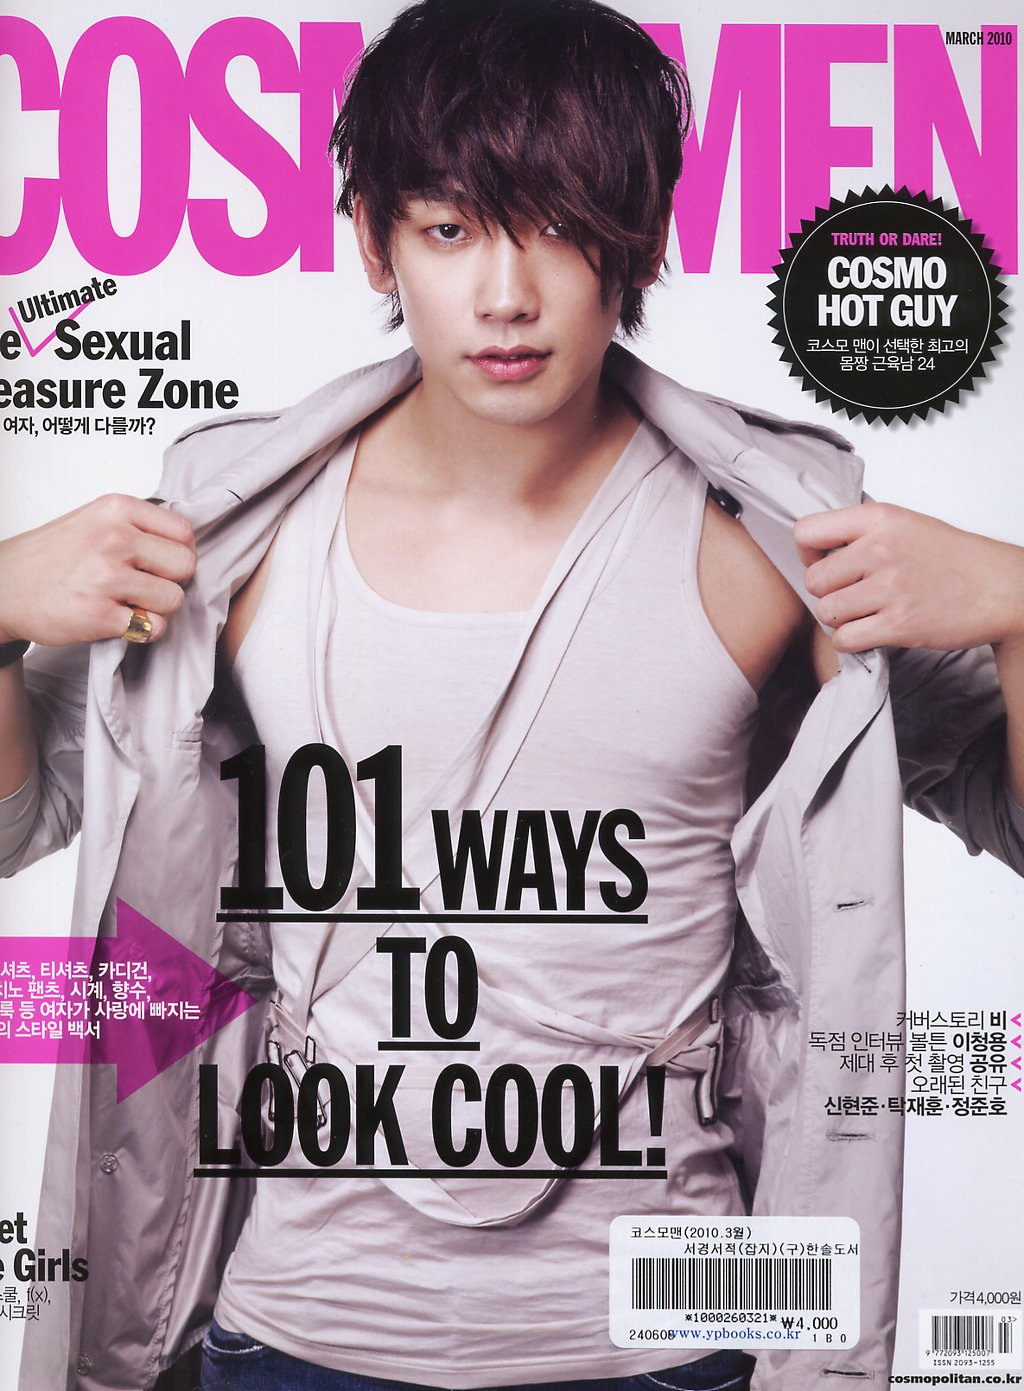 cosmopolitan_20100222022010.jpg